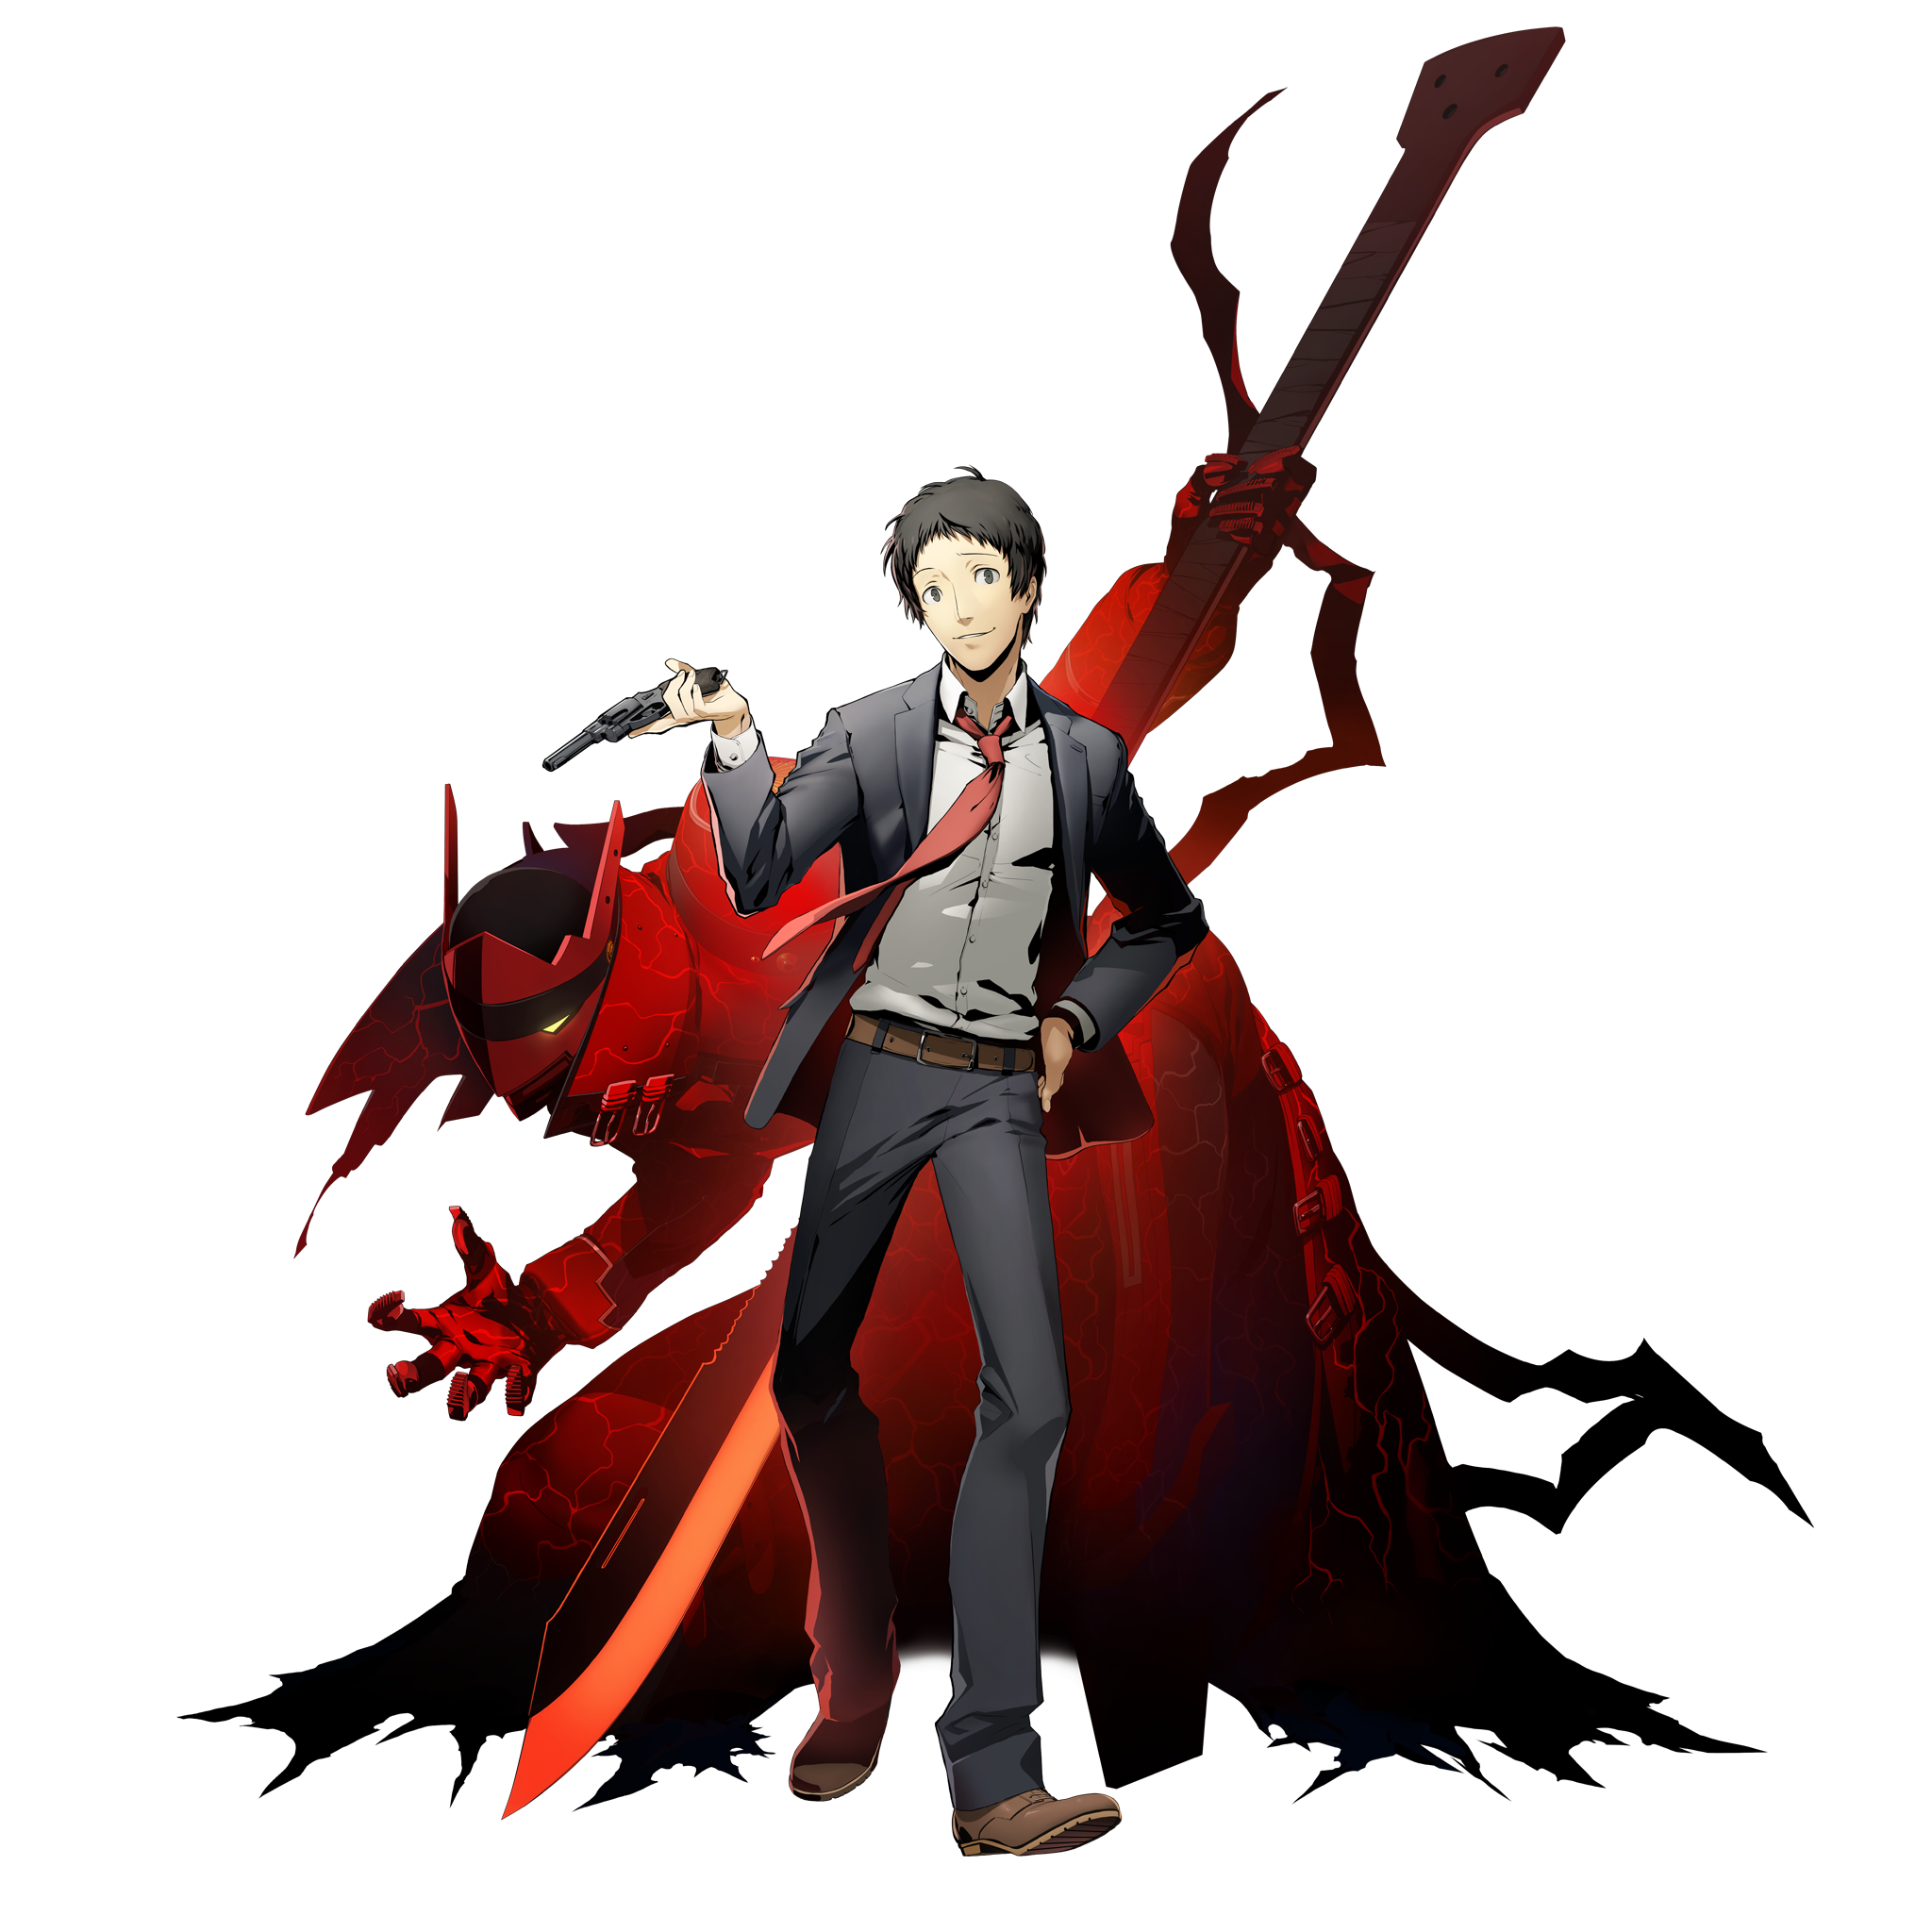 Persona 4 Magatsu Izanagi Wallpaper | Biajingan Wall